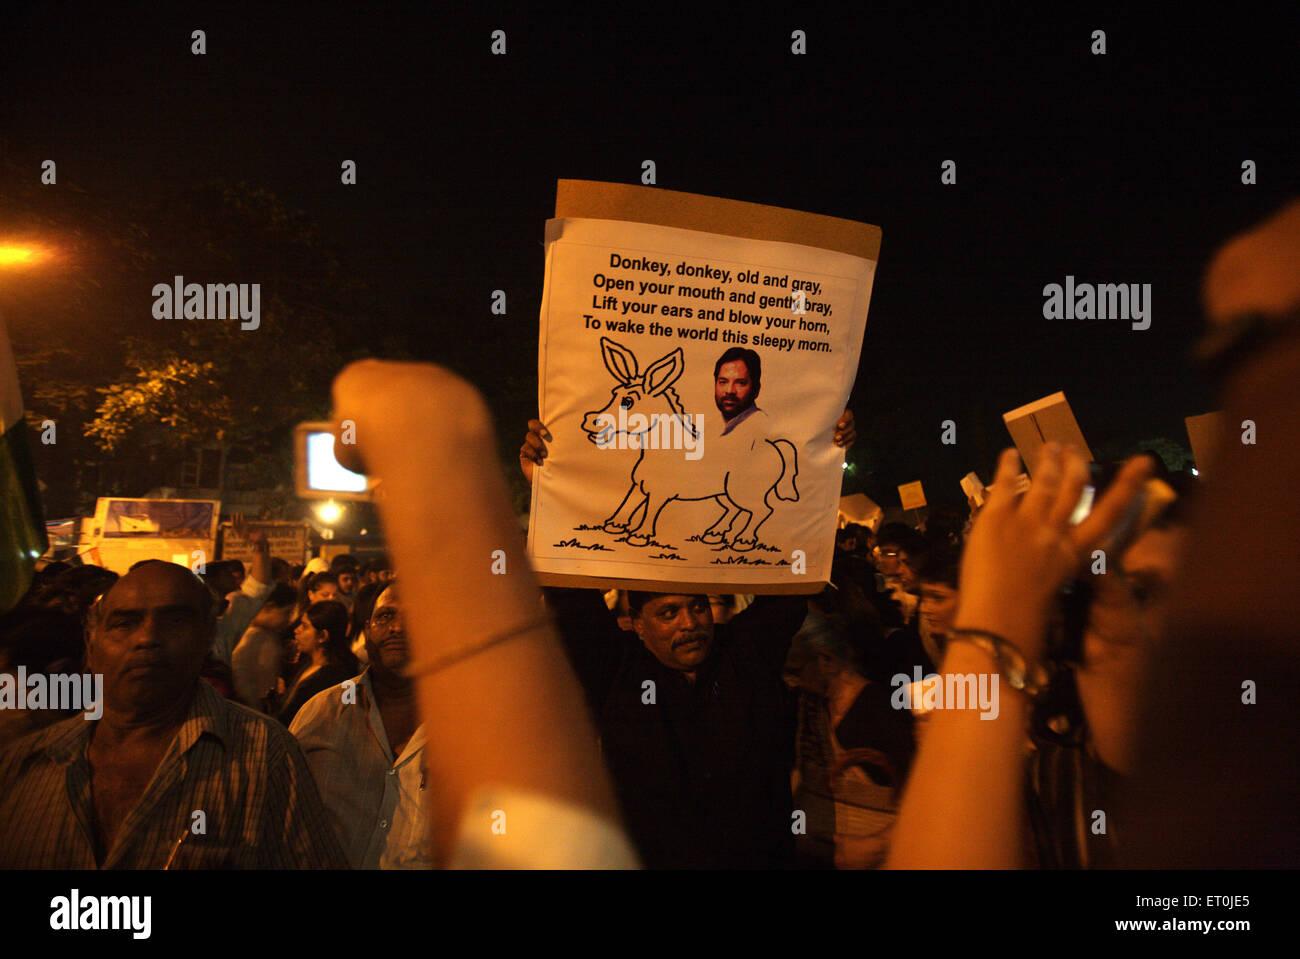 People holding placard cartoons senior BJP leader Naqvi sitting donkey mass protest terrorist attack 26th November - Stock Image